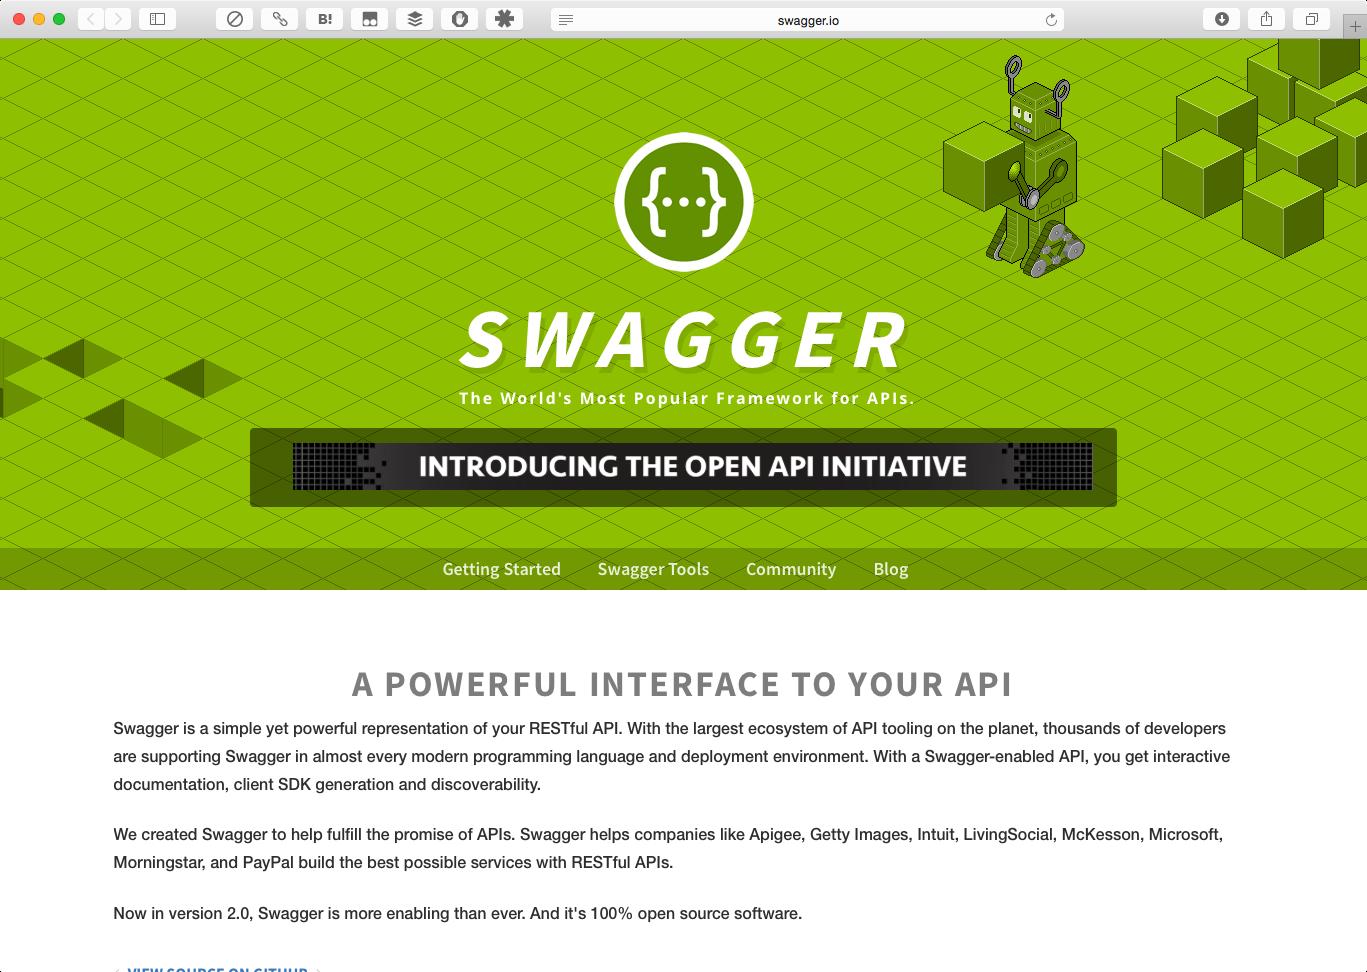 SwaggerのWebサイト